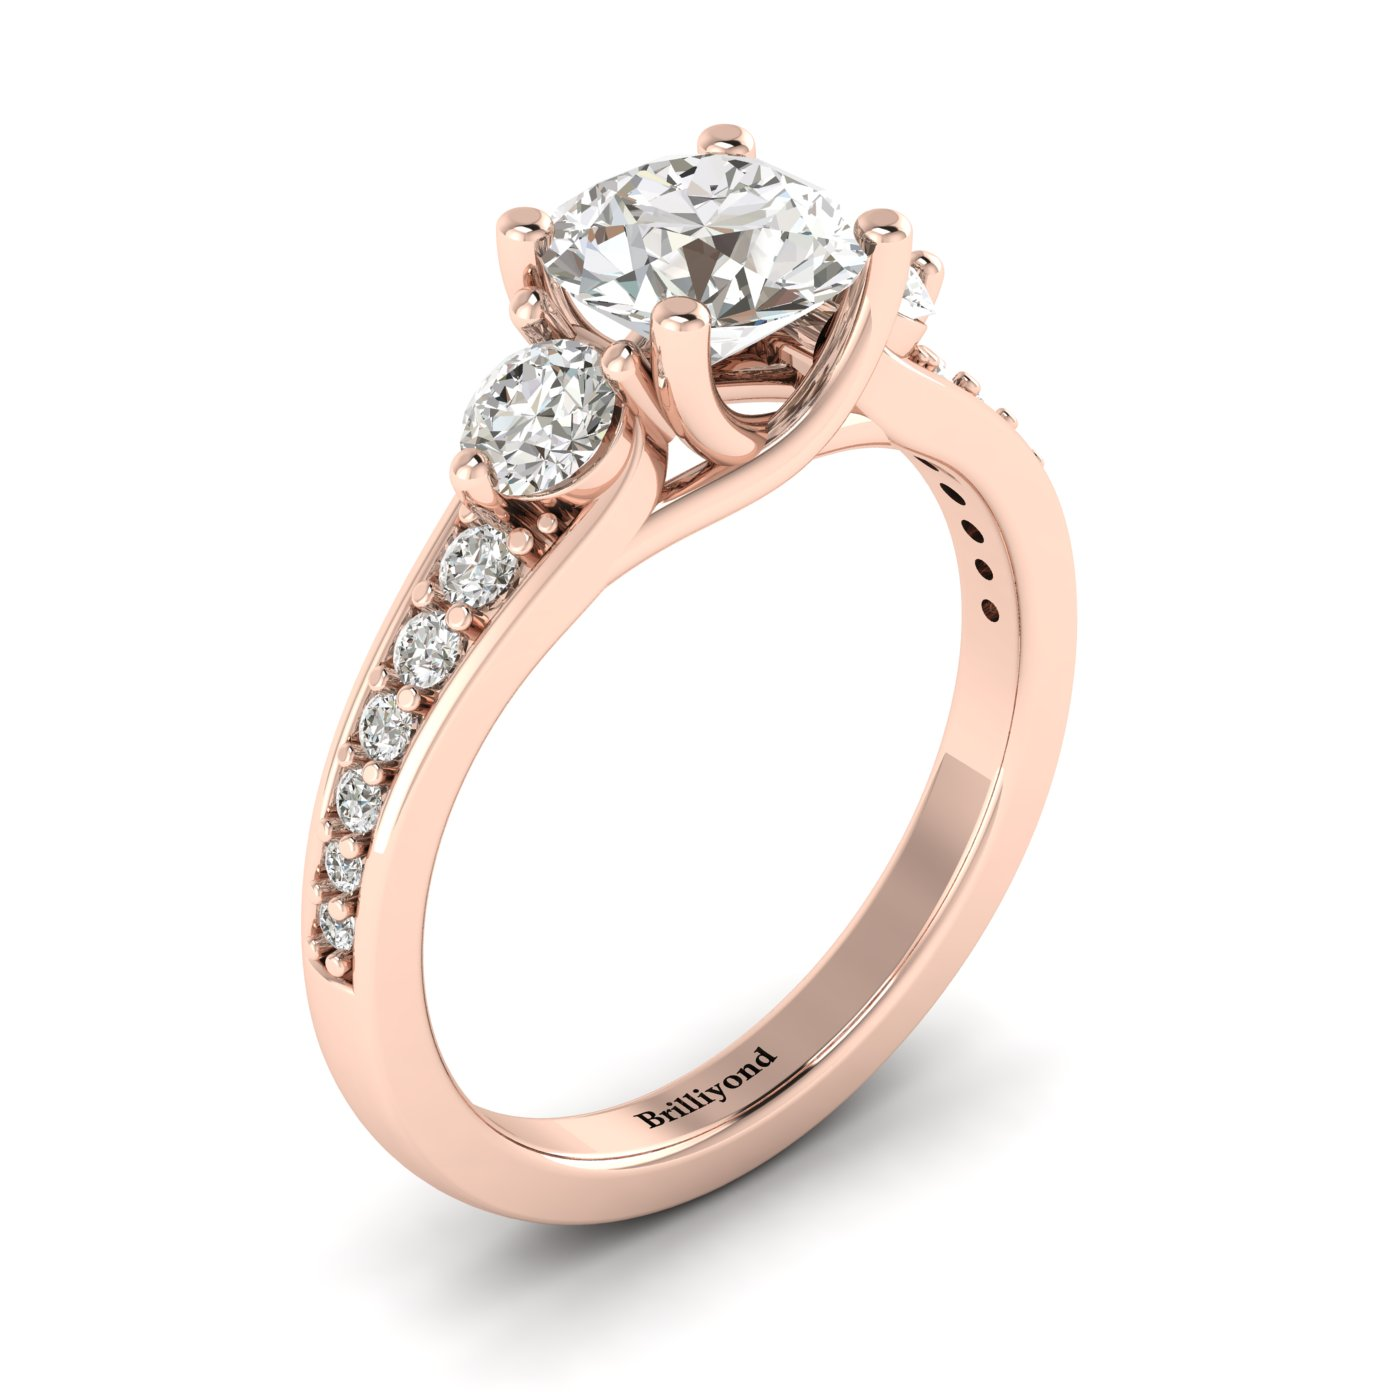 White Sapphire Rose Gold Three Stone Engagement Ring Sorento_image1